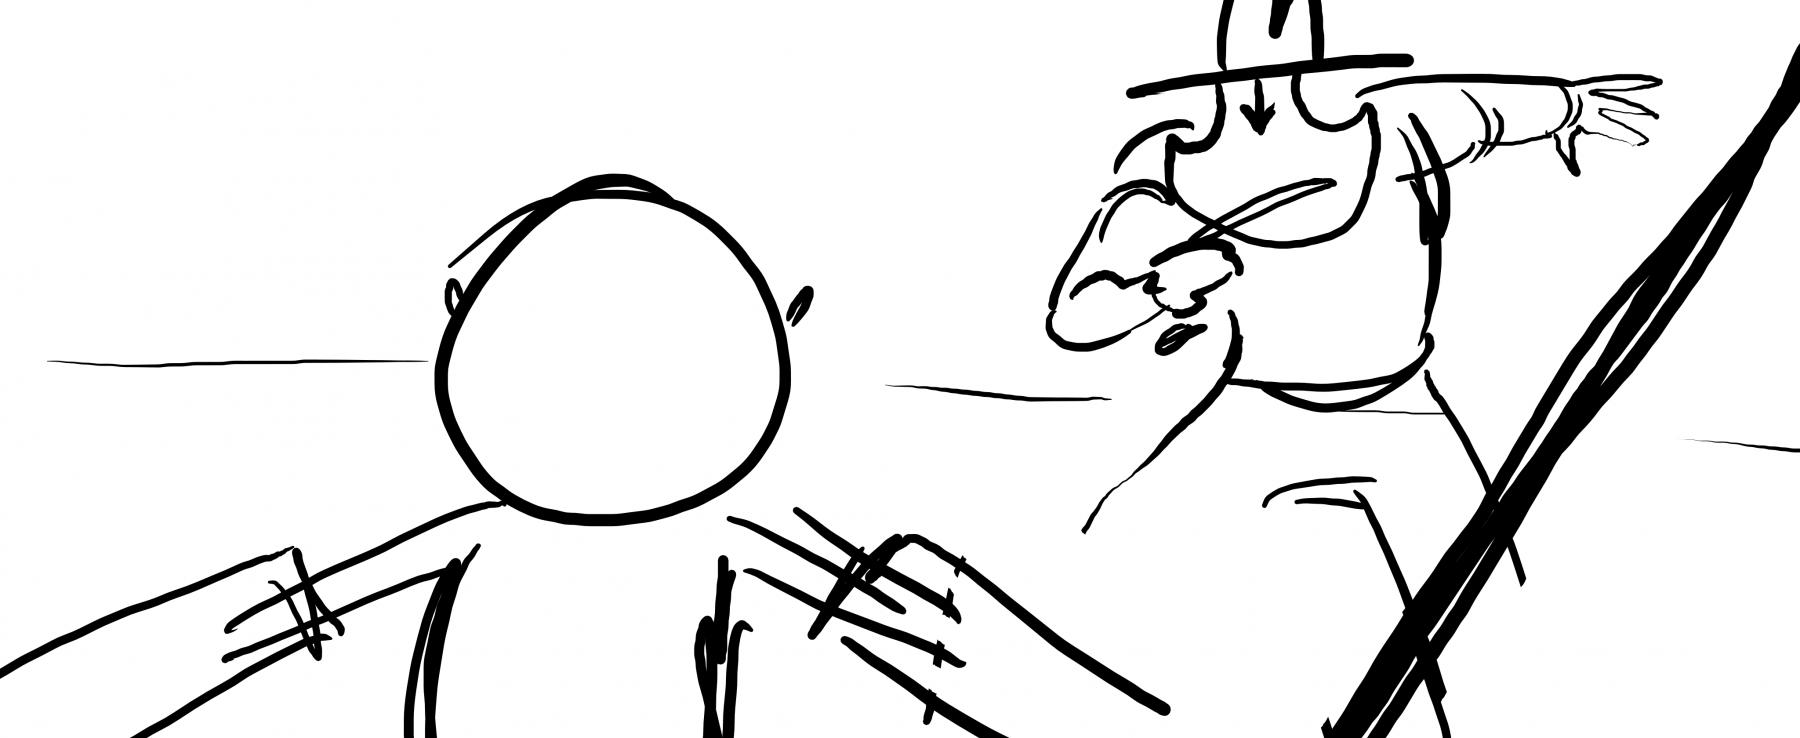 Nut-Thumbnail-Rough-Board00259